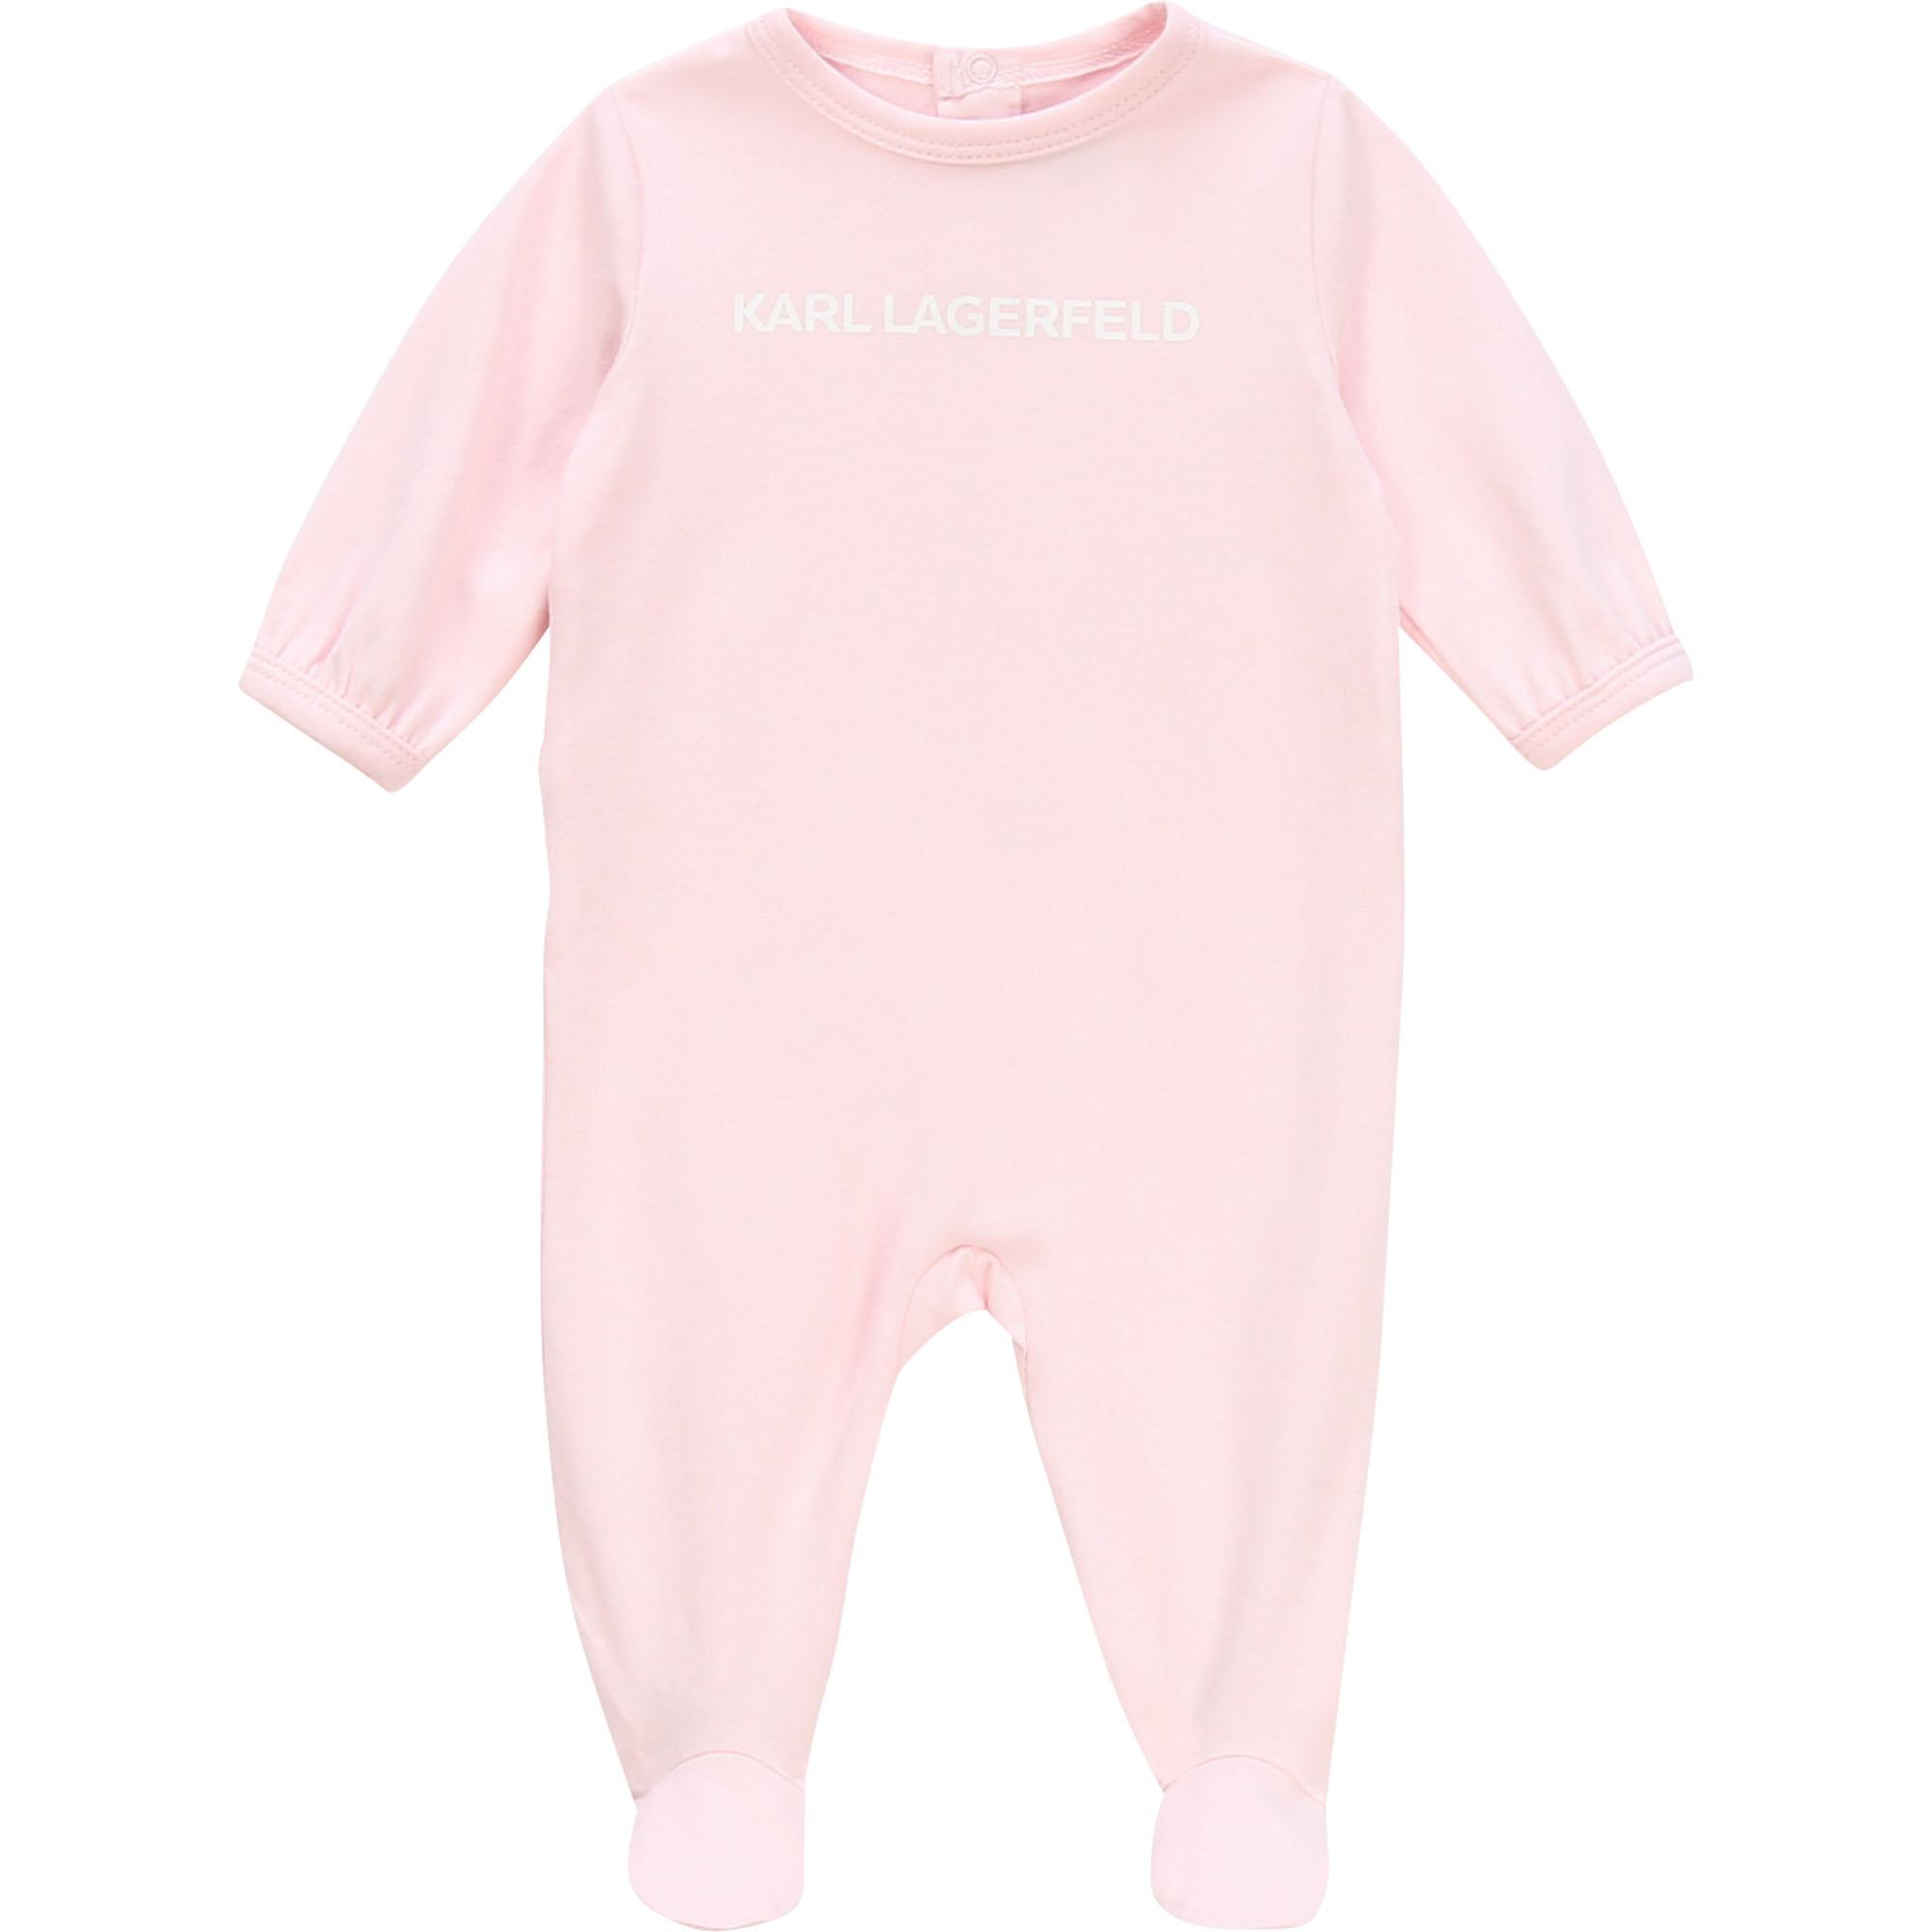 Pyjama intégral avec logo KARL LAGERFELD KIDS BEBE COUCHE UNISEXE Rose